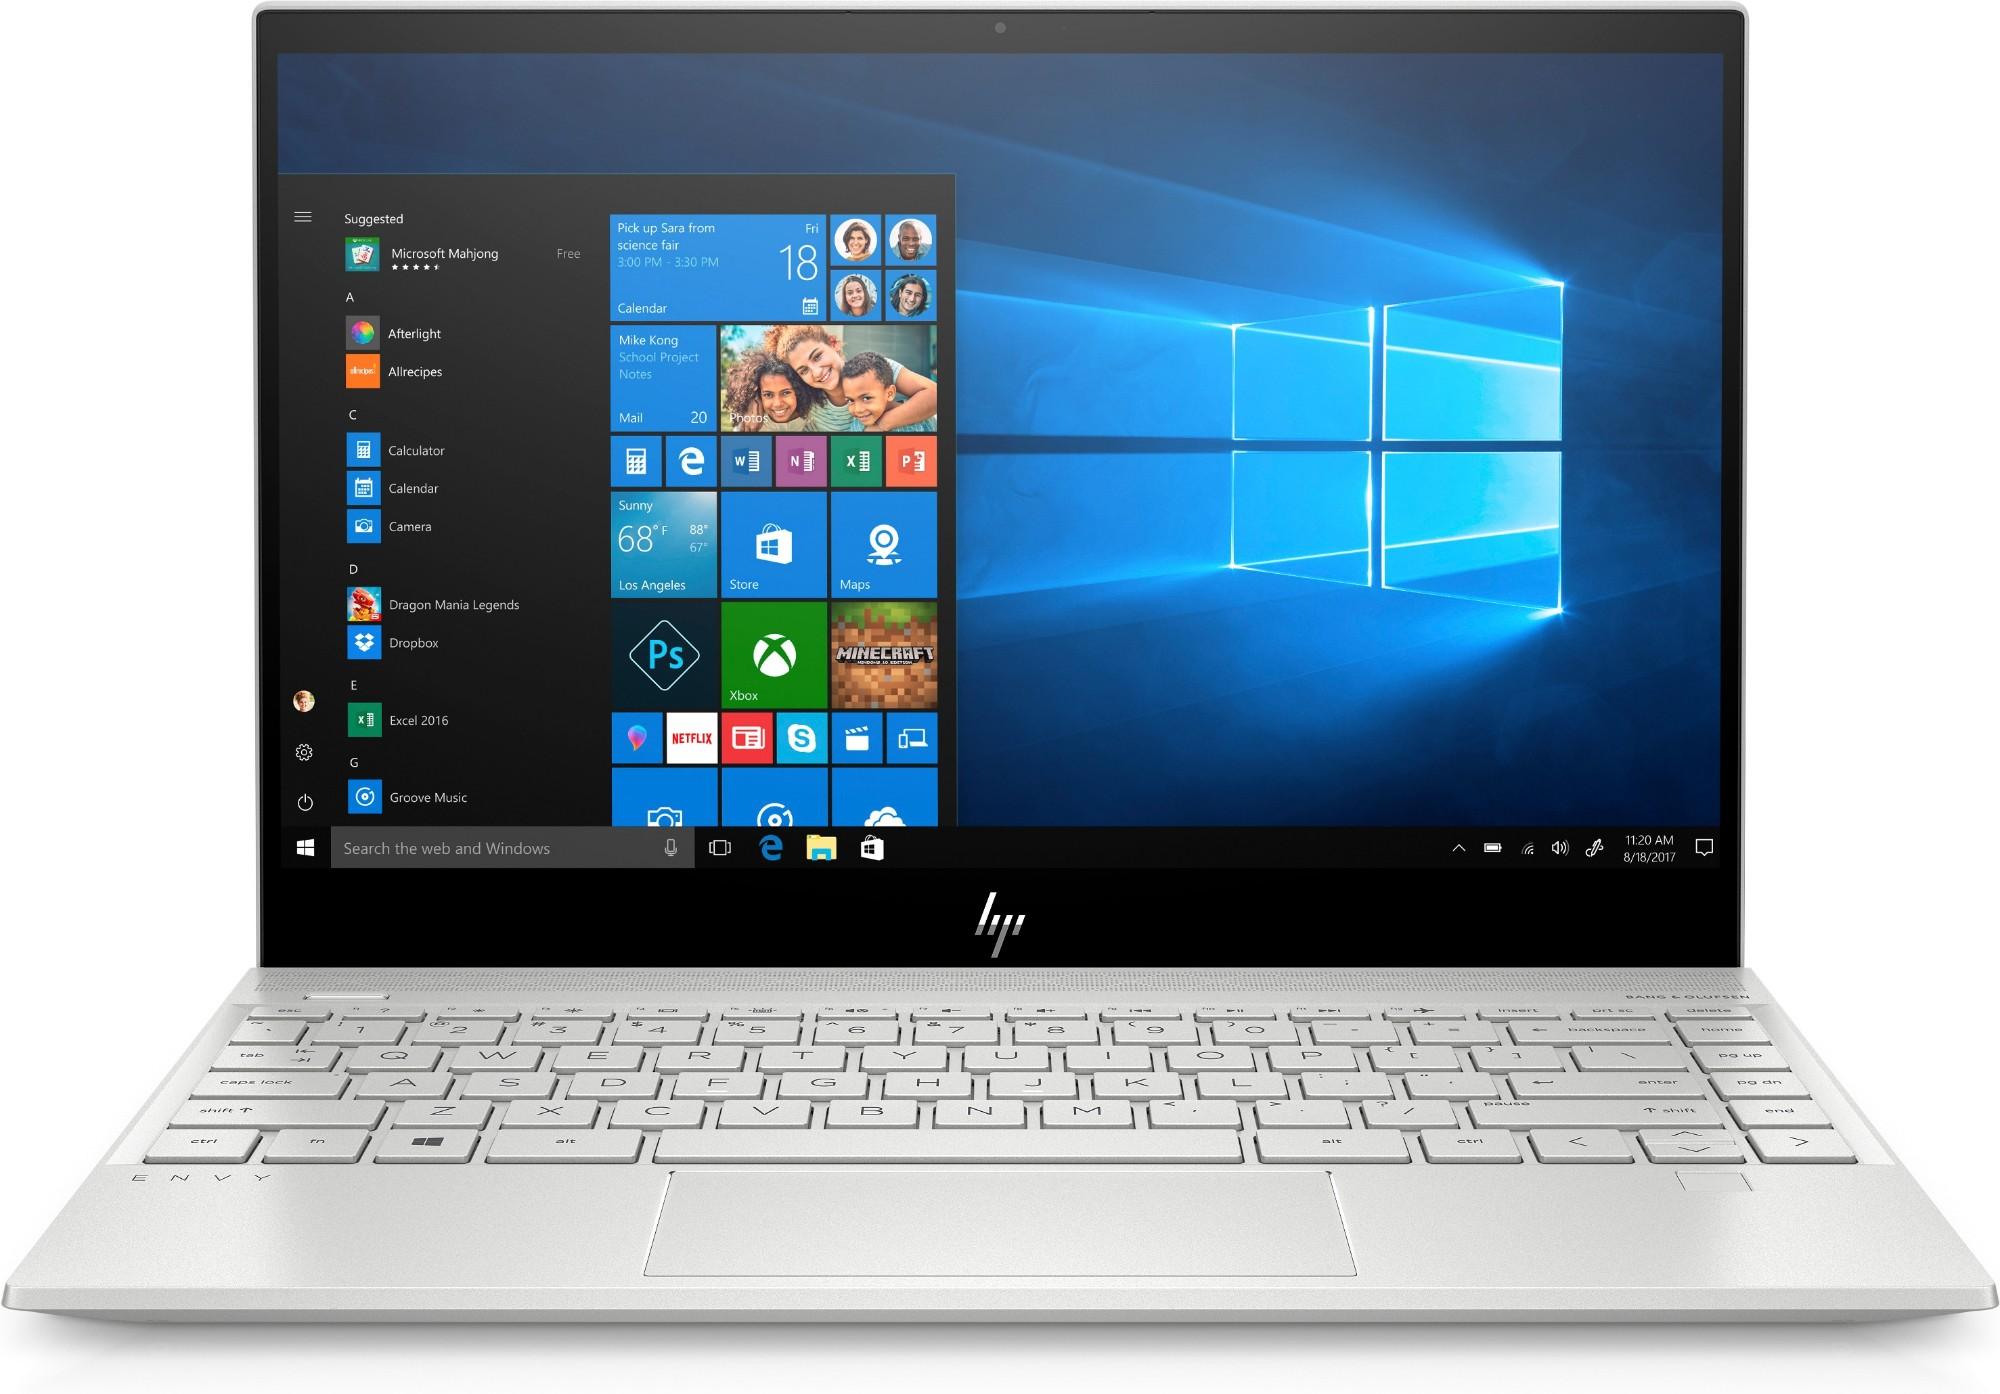 HP ENVY - 13-aq1008na Notebook Silver 33.8 cm (13.3